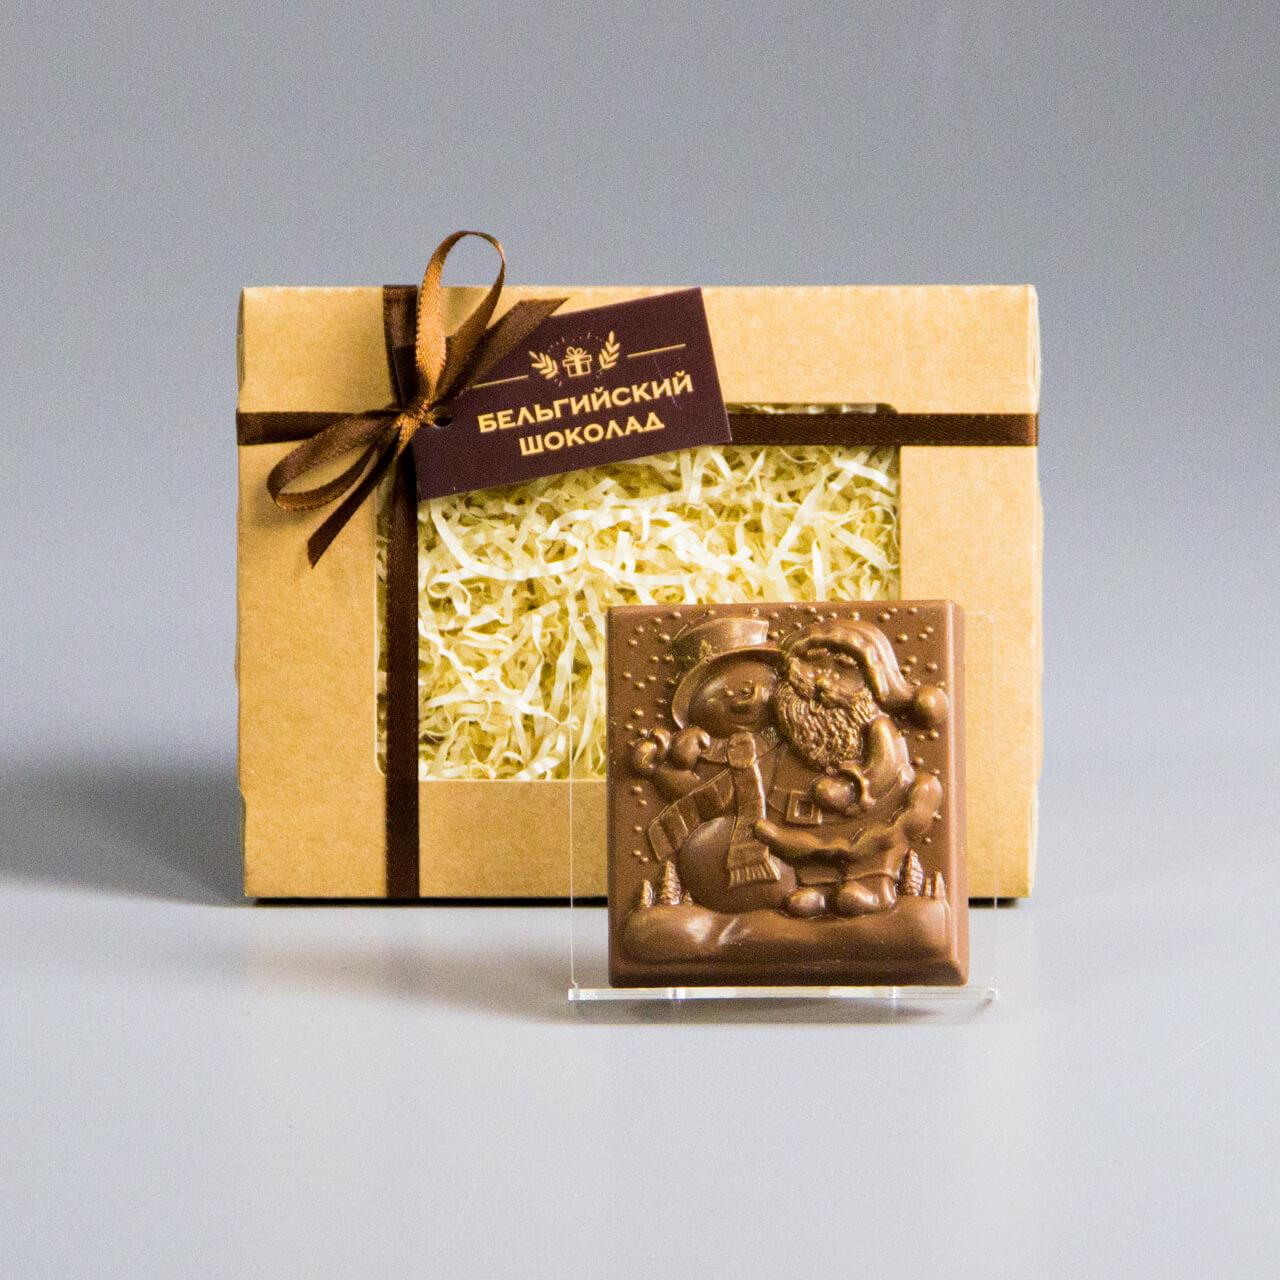 Шоколадная фигурка «Дед Мороз и Снеговик»